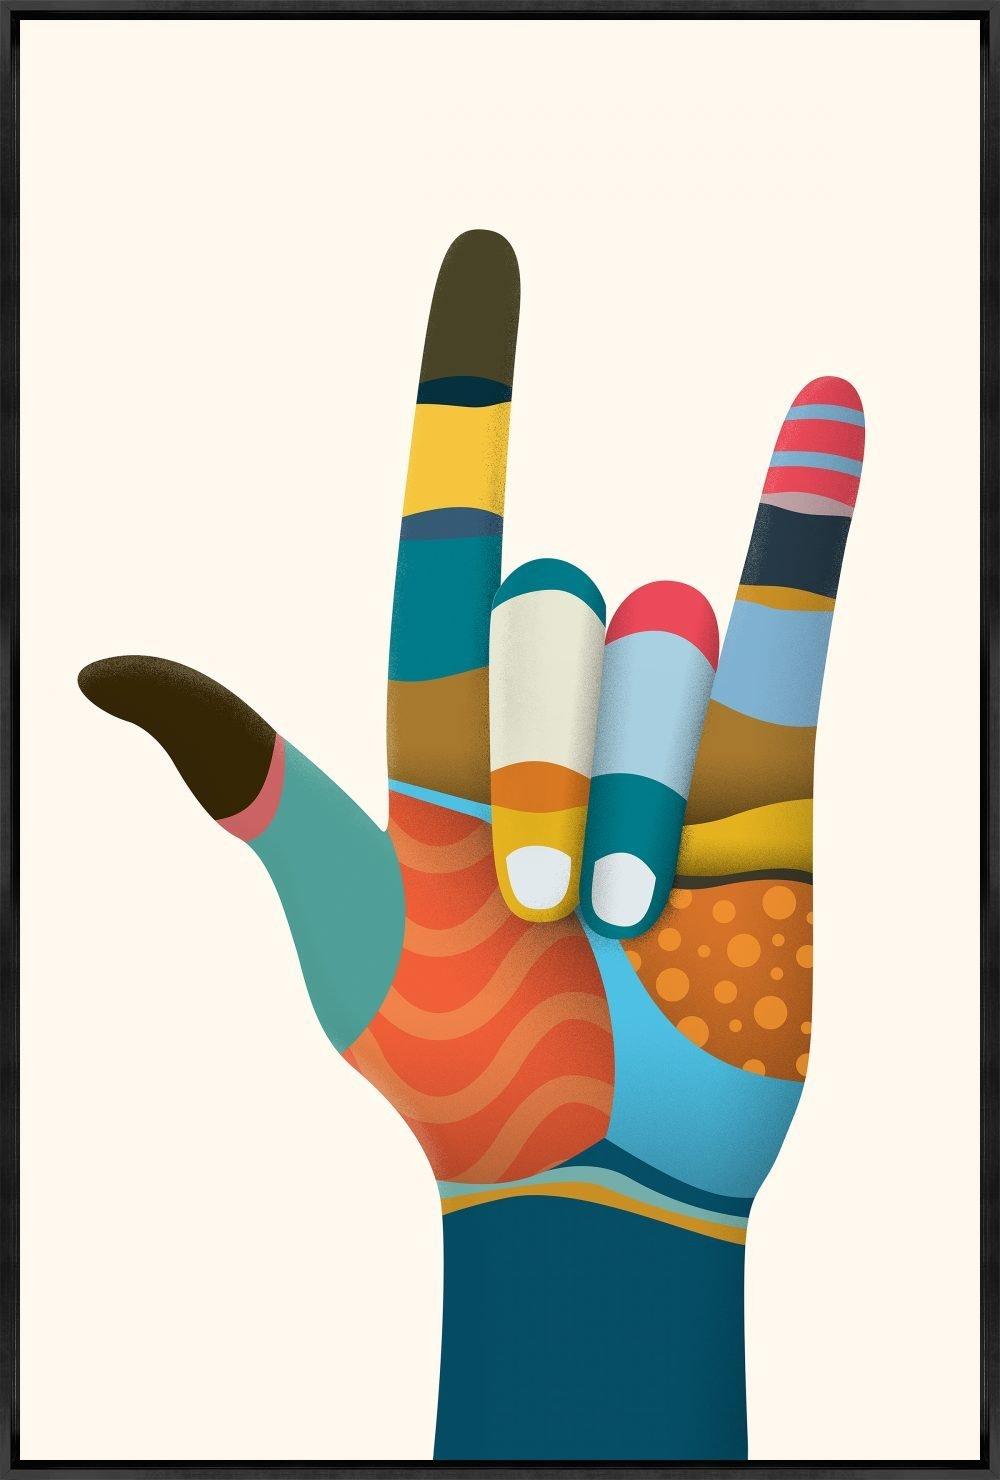 Hand Symbols I by Richard Silver